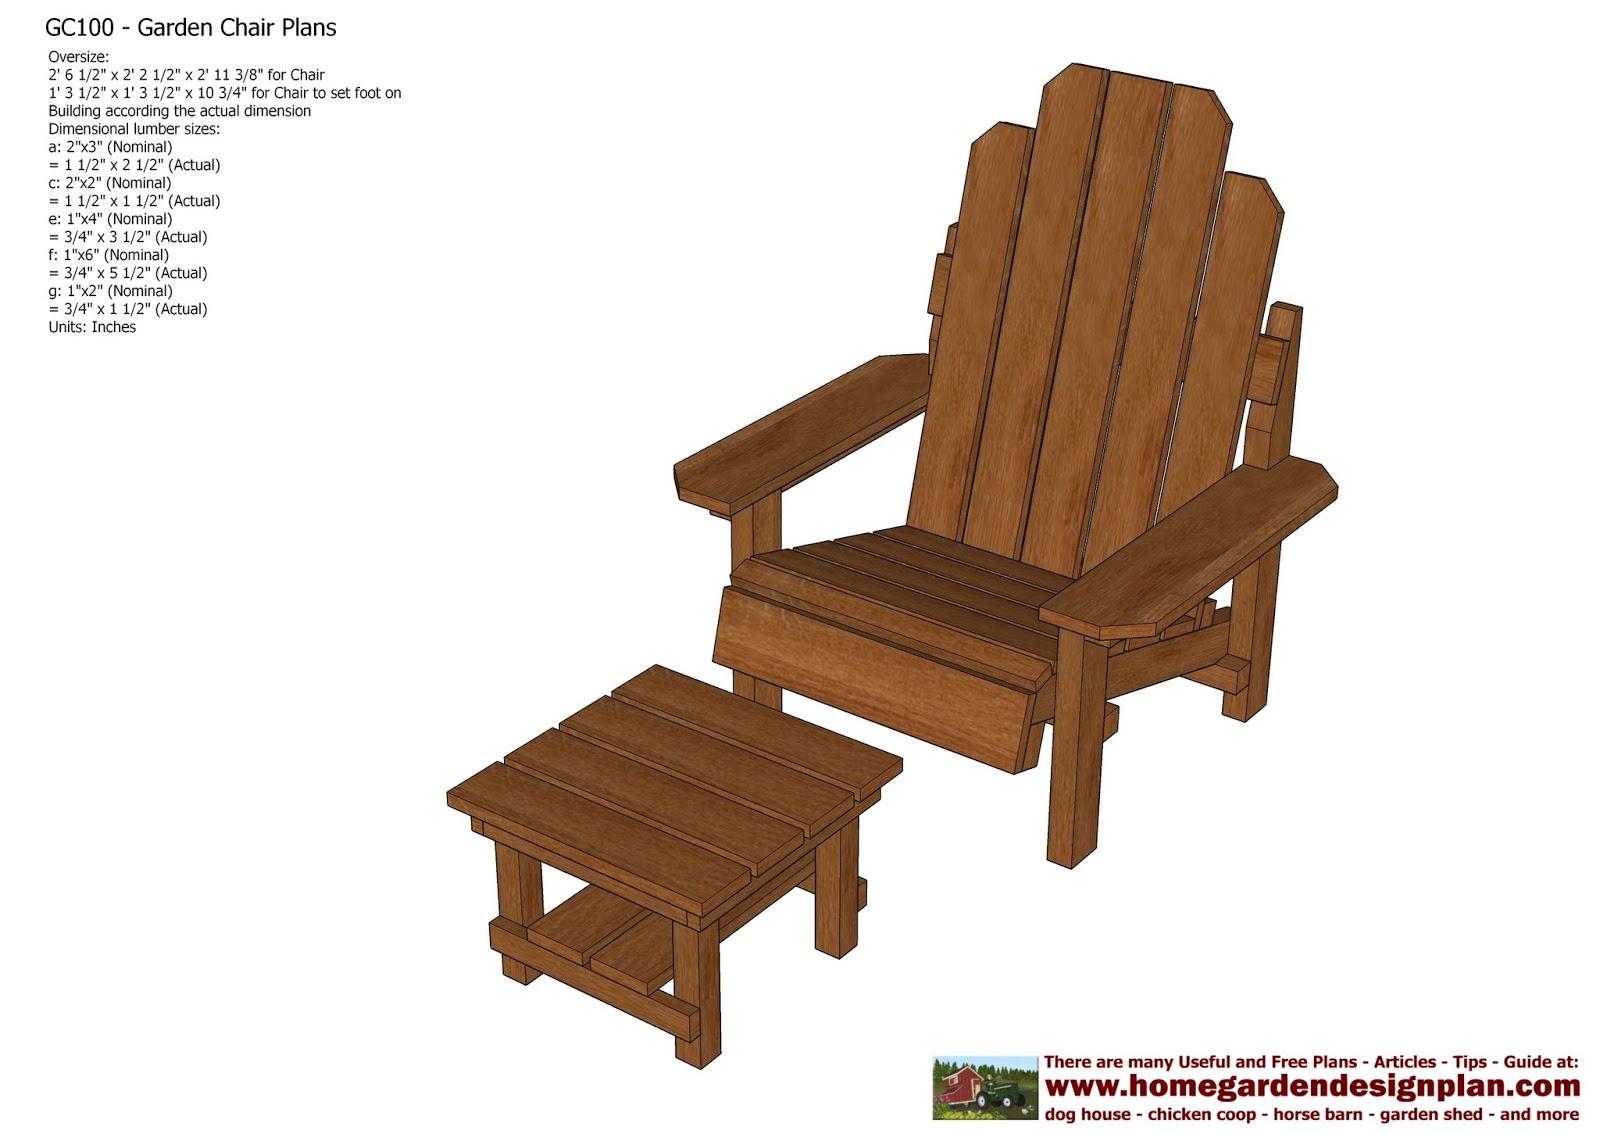 Chair Design Garden Power Accessories Cup Holder Home Plans Gc100 Out Door